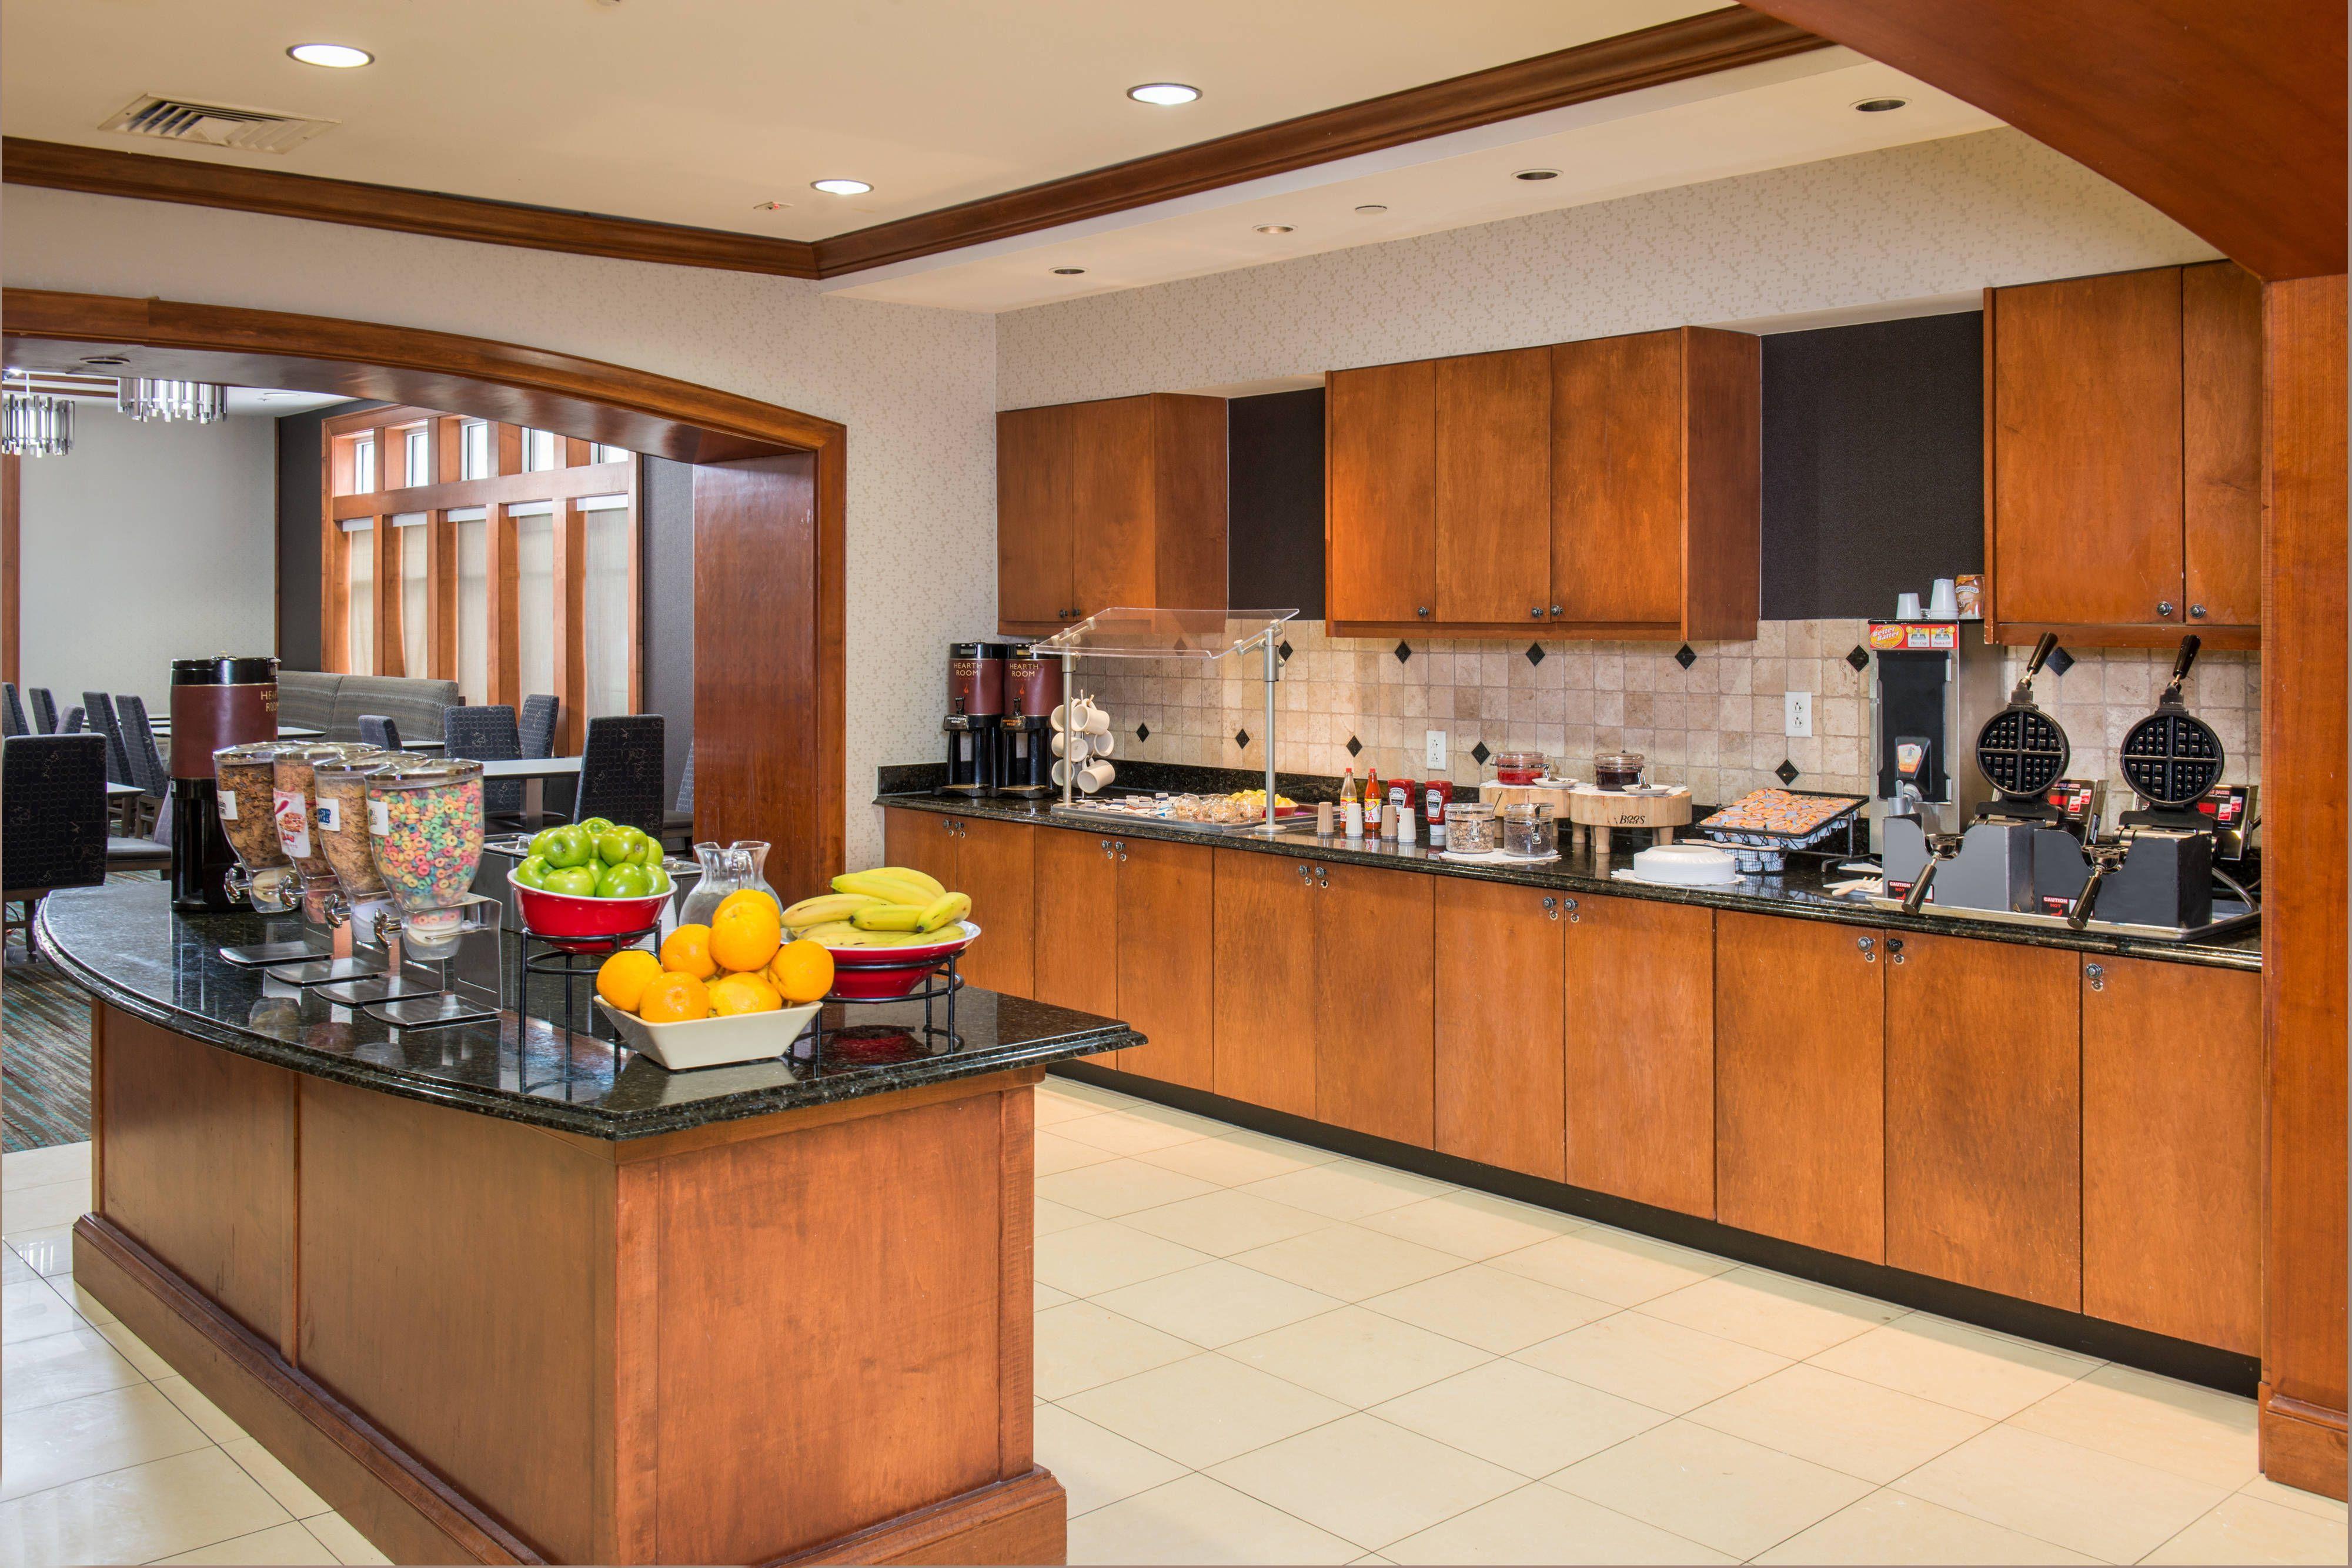 Residence Inn Chesapeake Greenbrier Breakfast Buffet